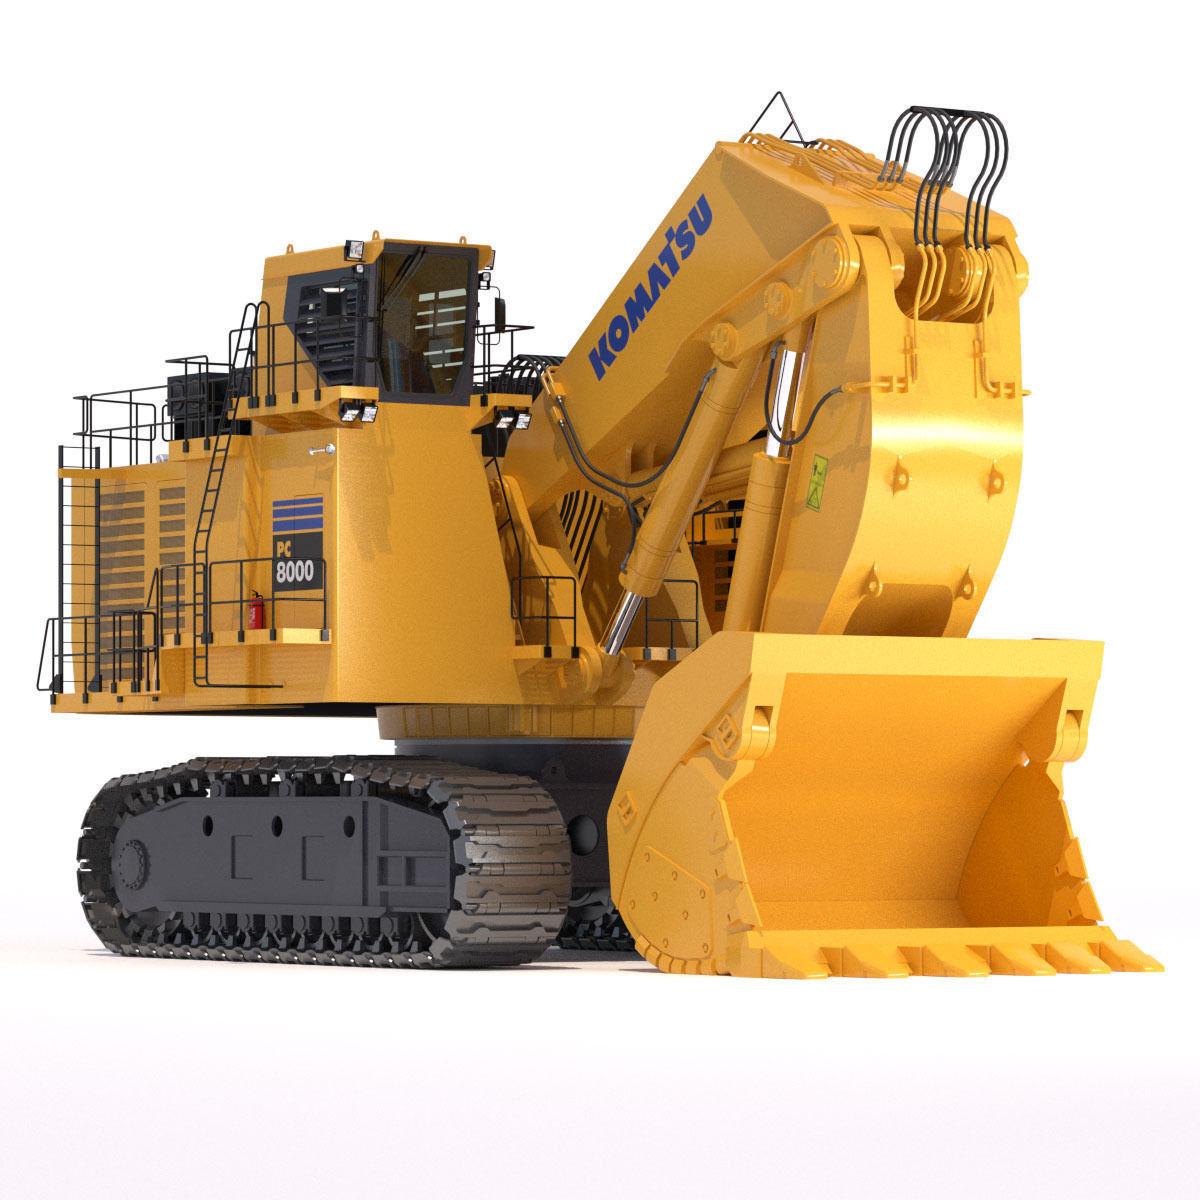 komatsu d20a 7 bulldozer sn 78604 up operators manual